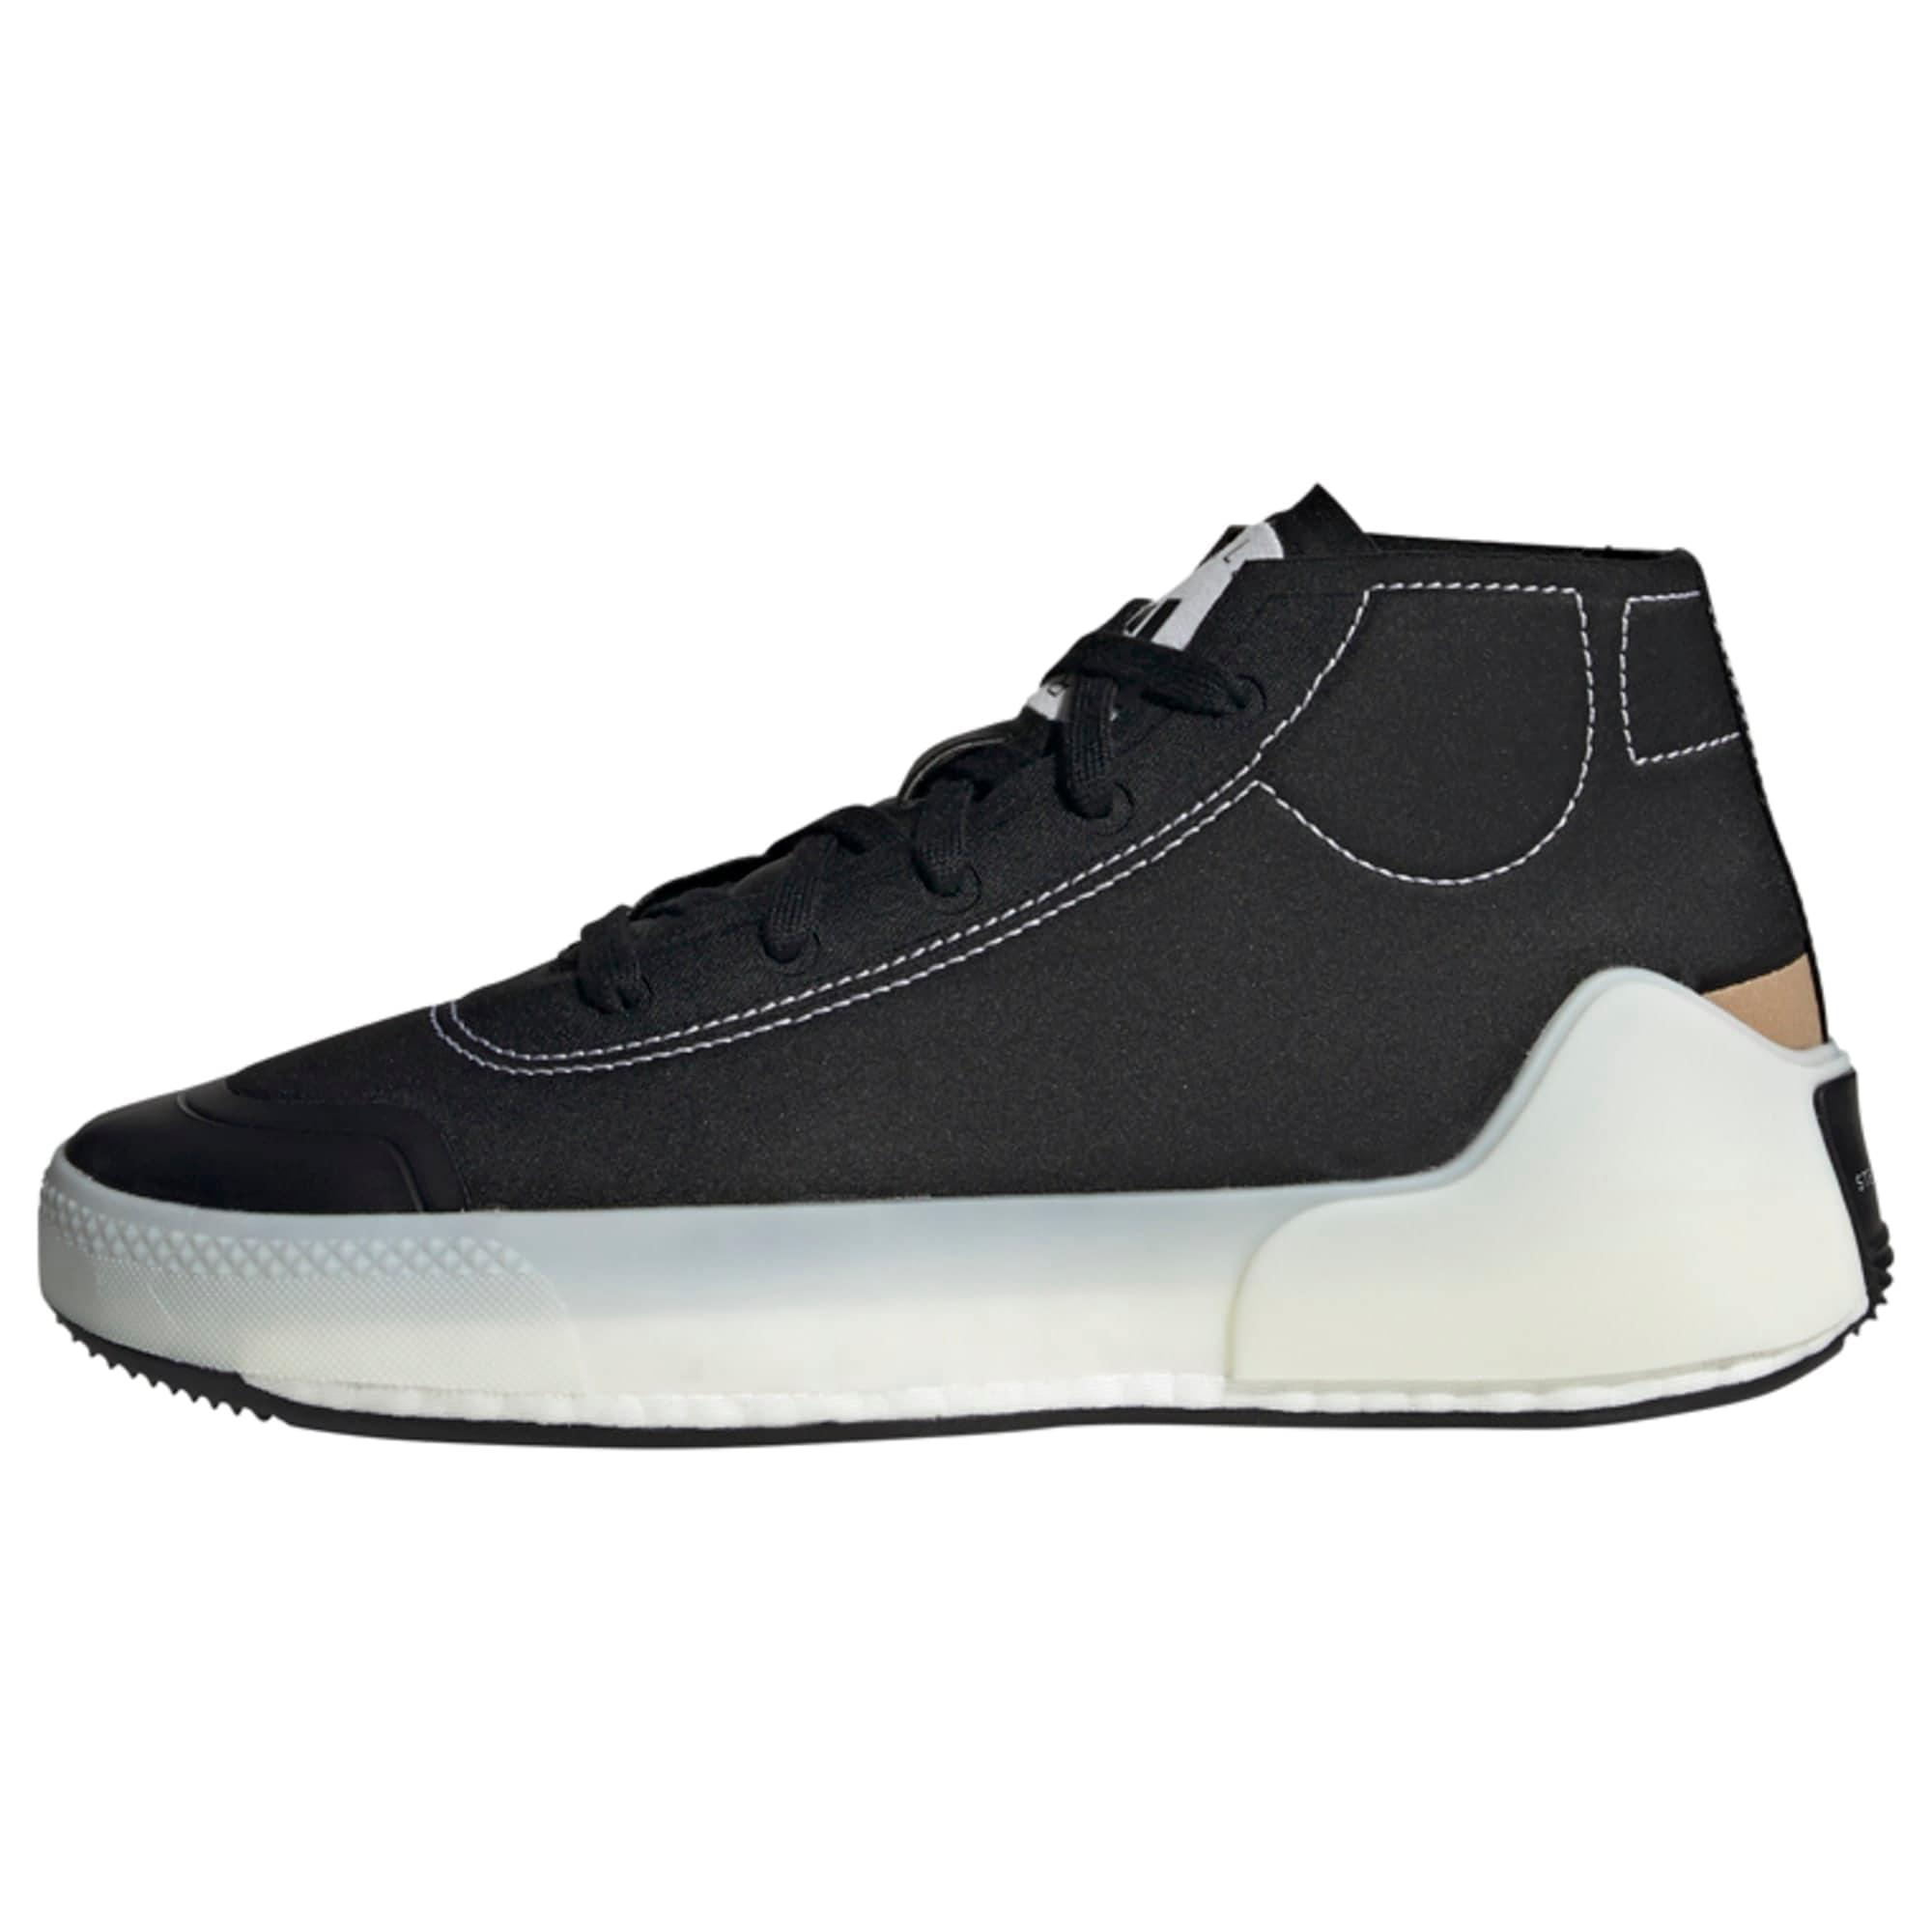 adidas by stella mccartney scarpa sportiva 'treino' nero